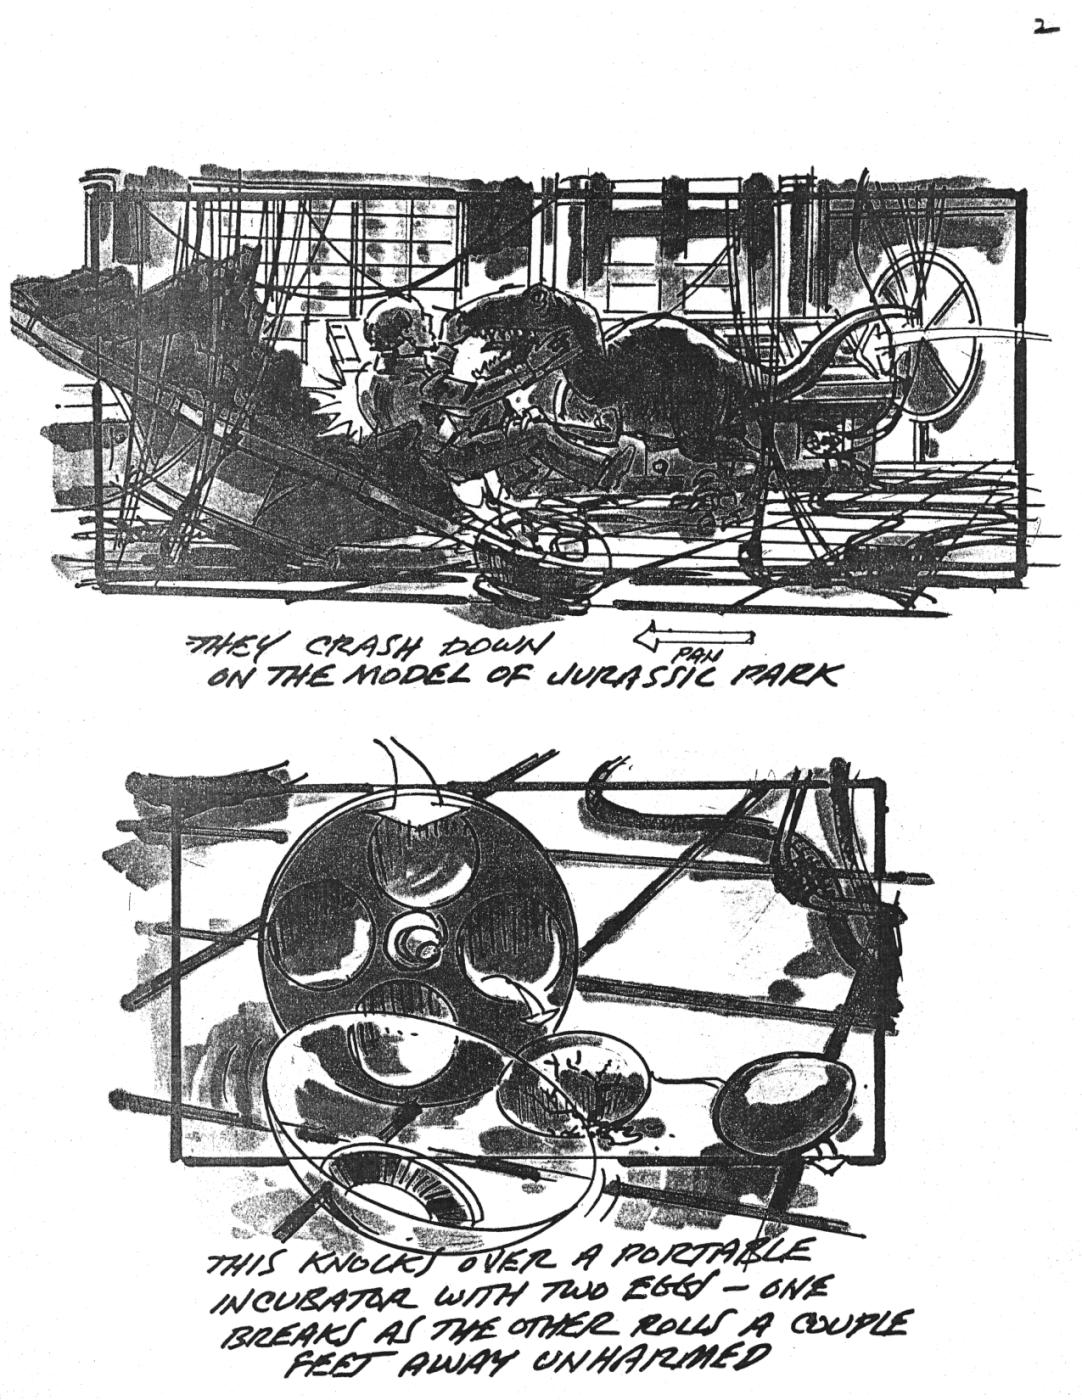 Image-01-New-Hammond-Raptor-Death-Jurassic-Park.png